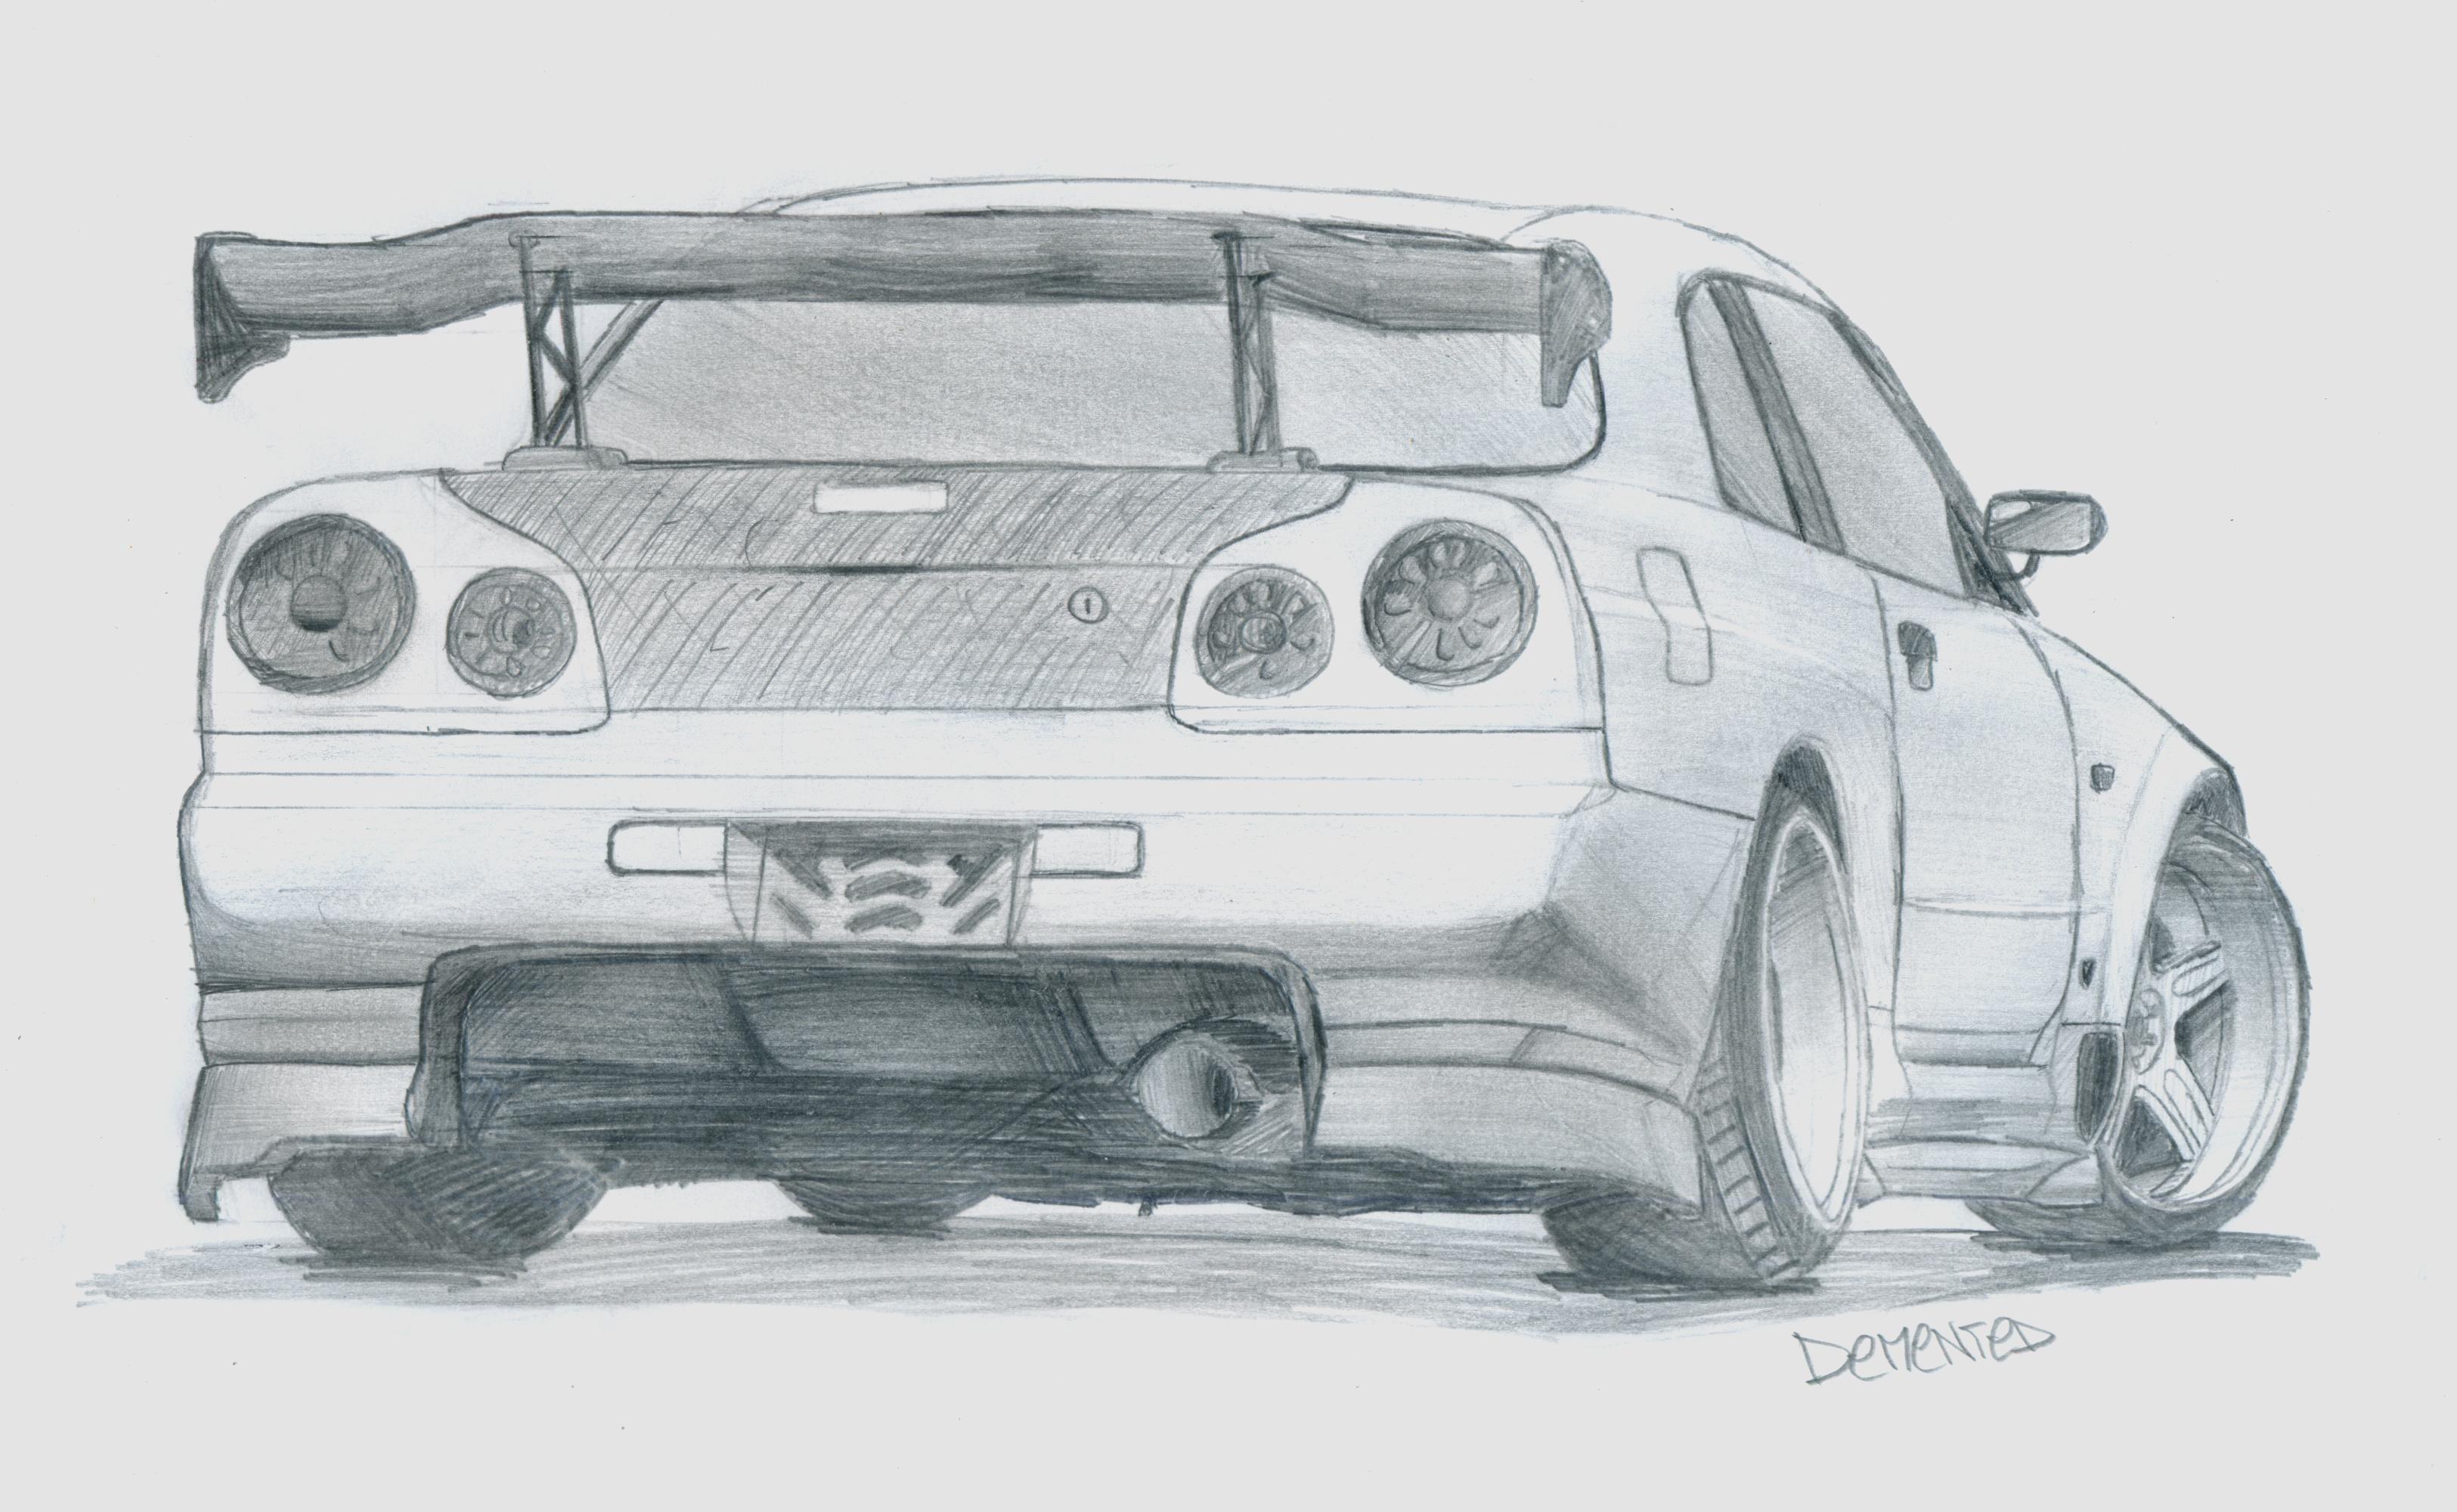 Line Drawing Nissan Gtr : Street racer s dream skyline r gtr by danchix on